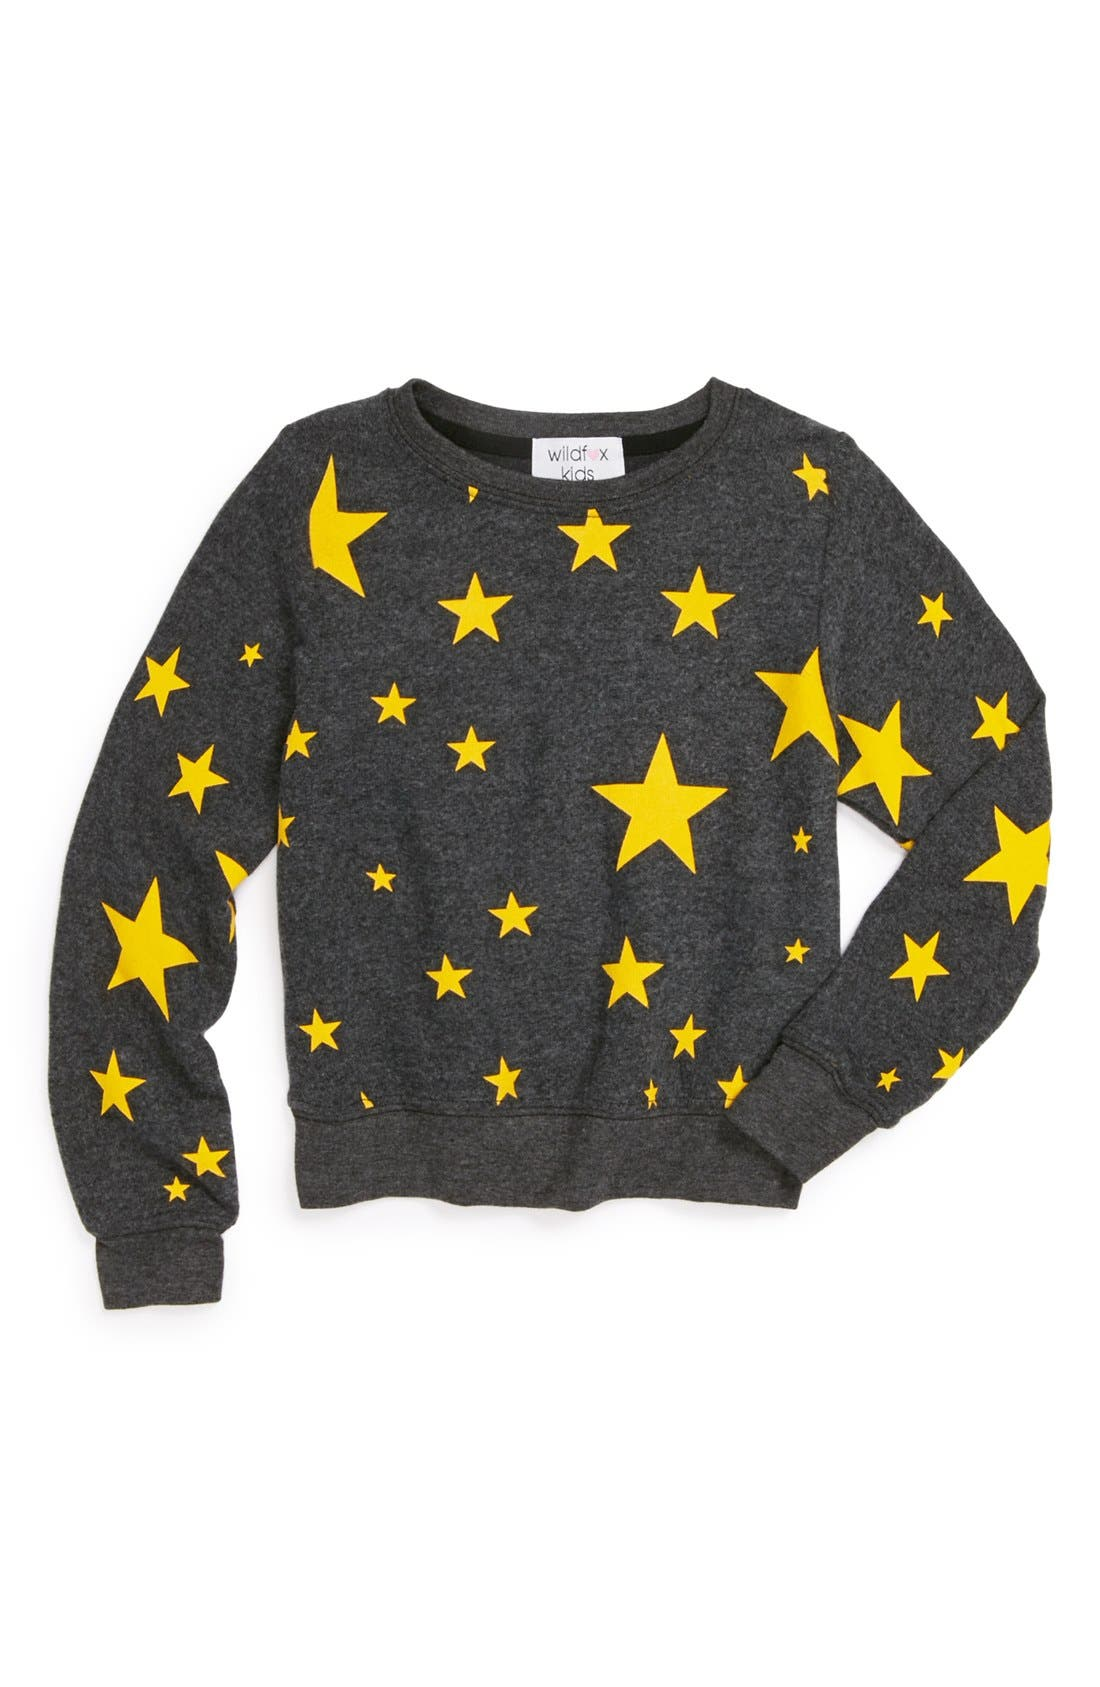 Alternate Image 1 Selected - Wildfox 'Disco Stars' Sweatshirt (Little Girls & Big Girls)